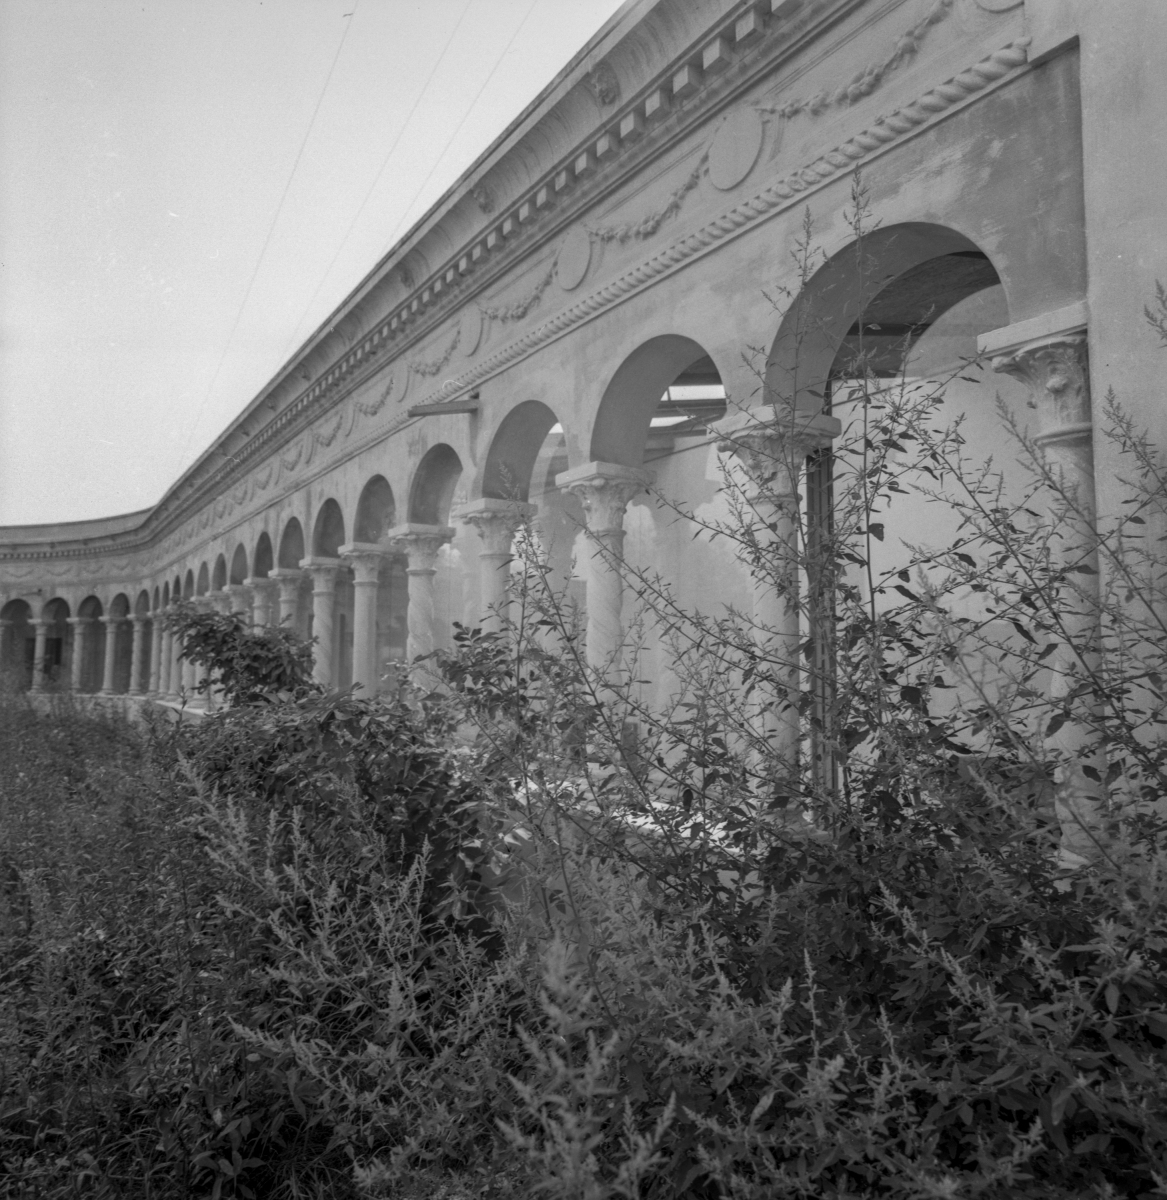 villamargherita4-1977